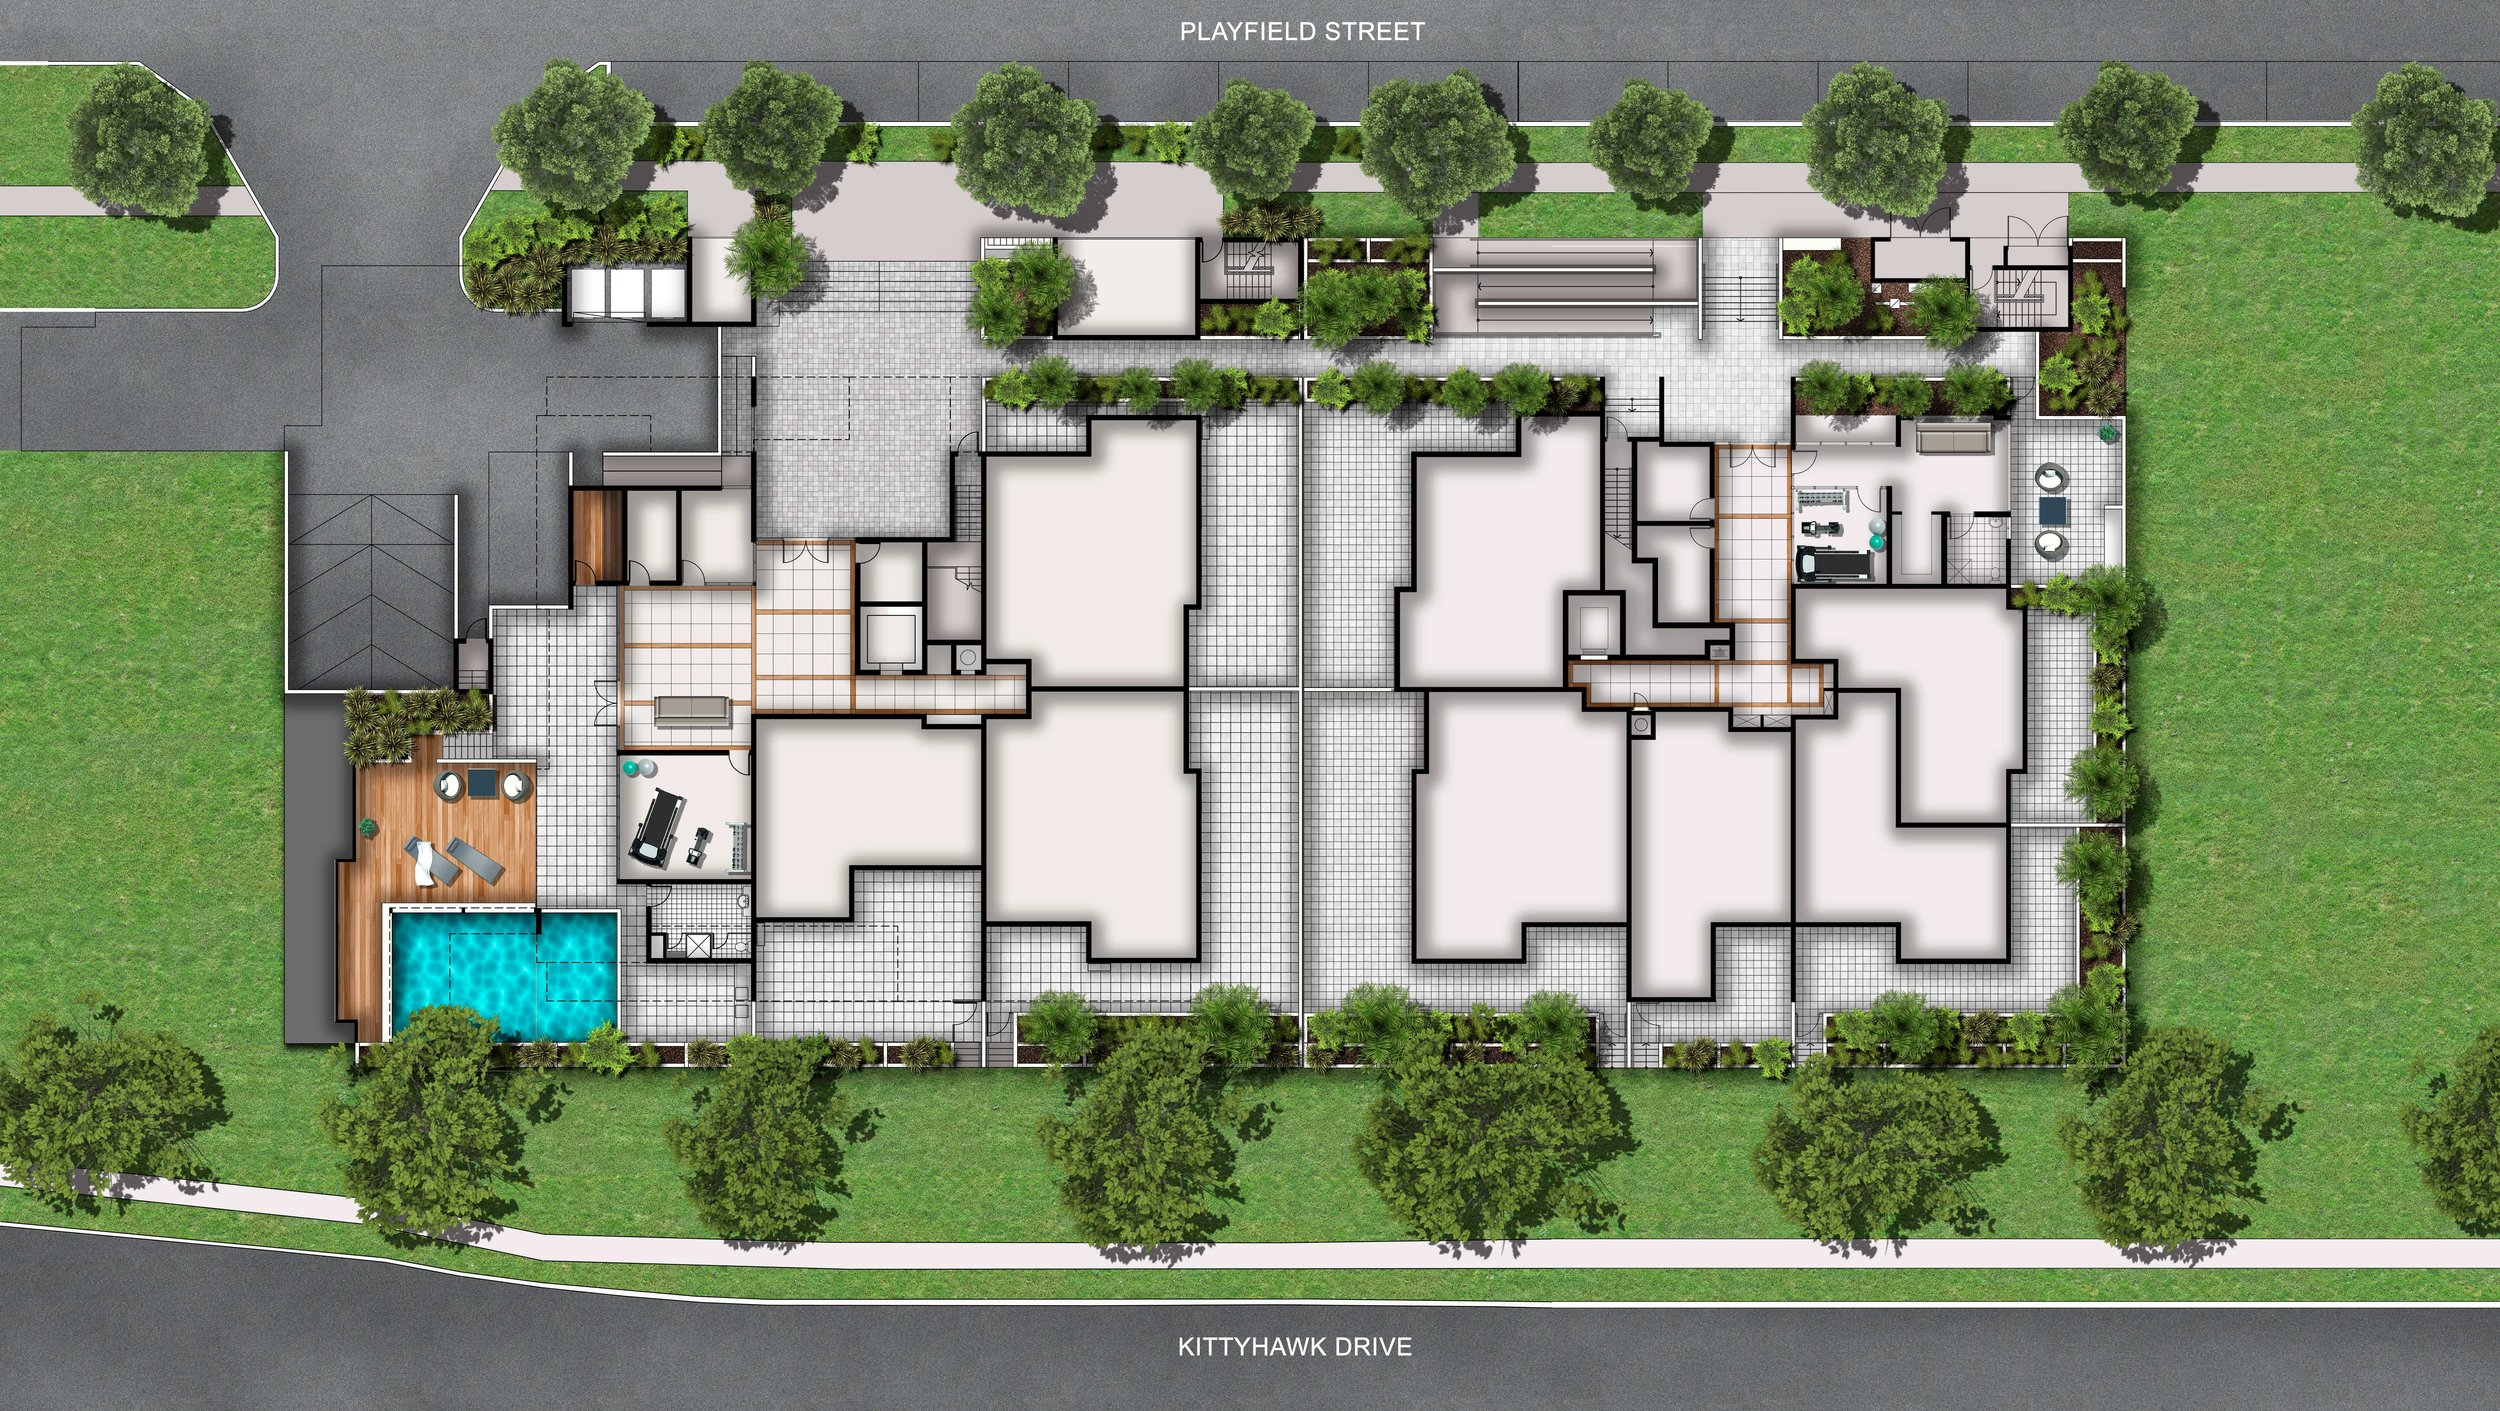 Oxford Apartments Site Plan